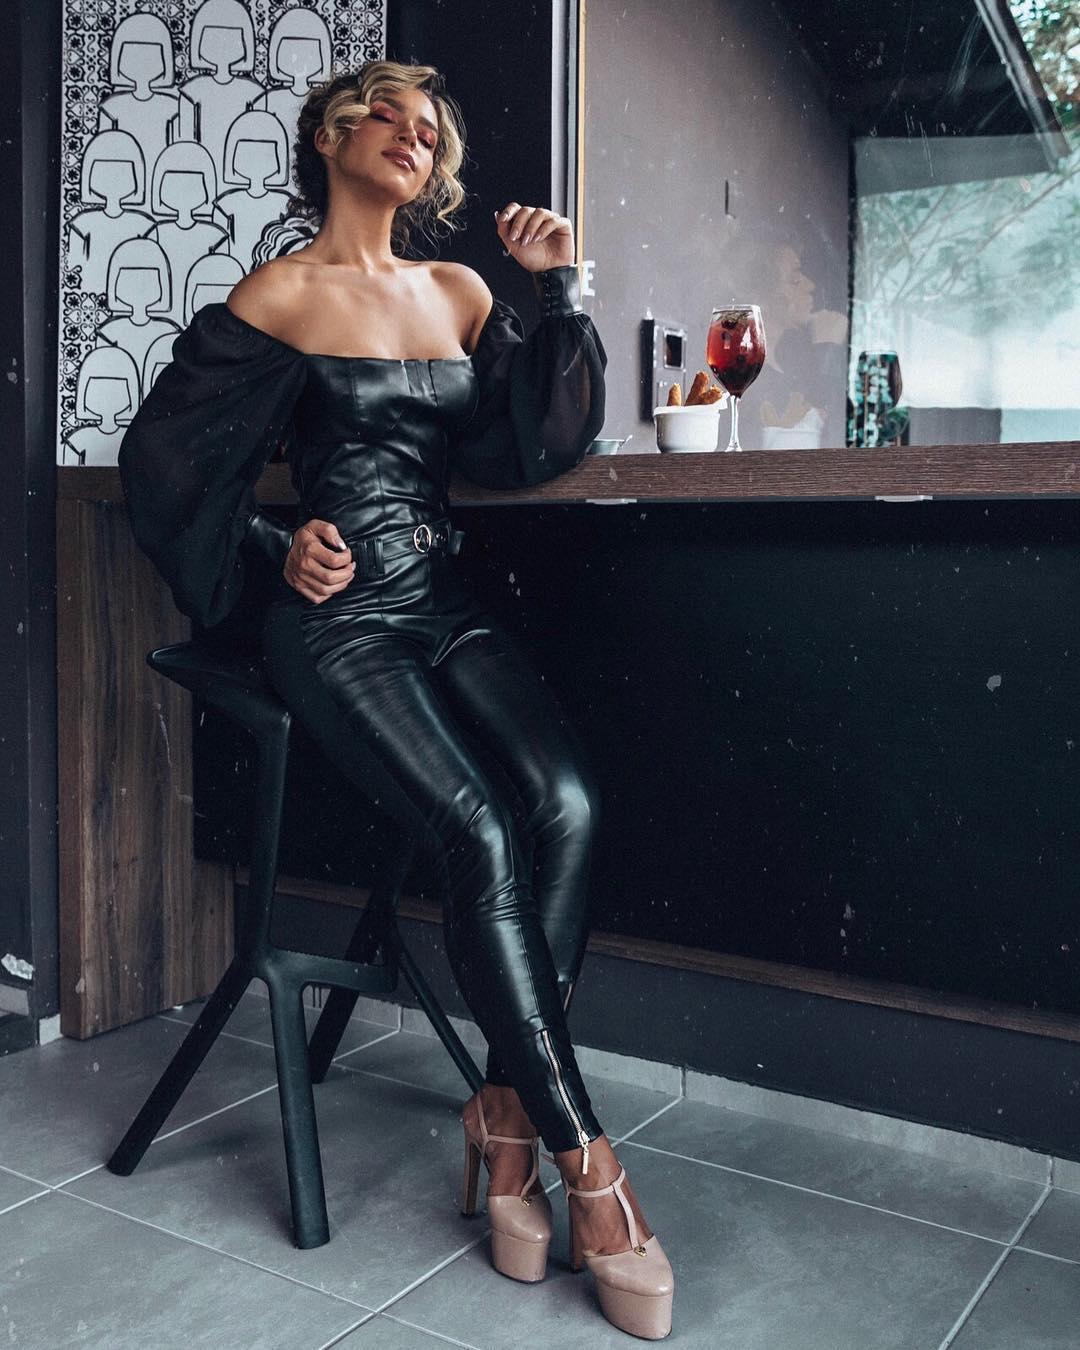 amanda cardoso, miss grand espirito santo 2019/3rd runner-up de miss intercontinental 2017. - Página 13 50890010